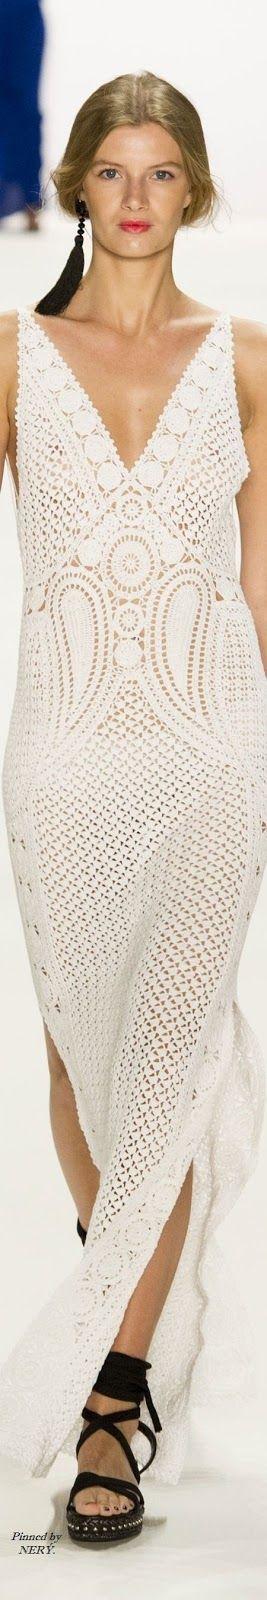 Crochetemoda Blog: Vestidos de Crochet